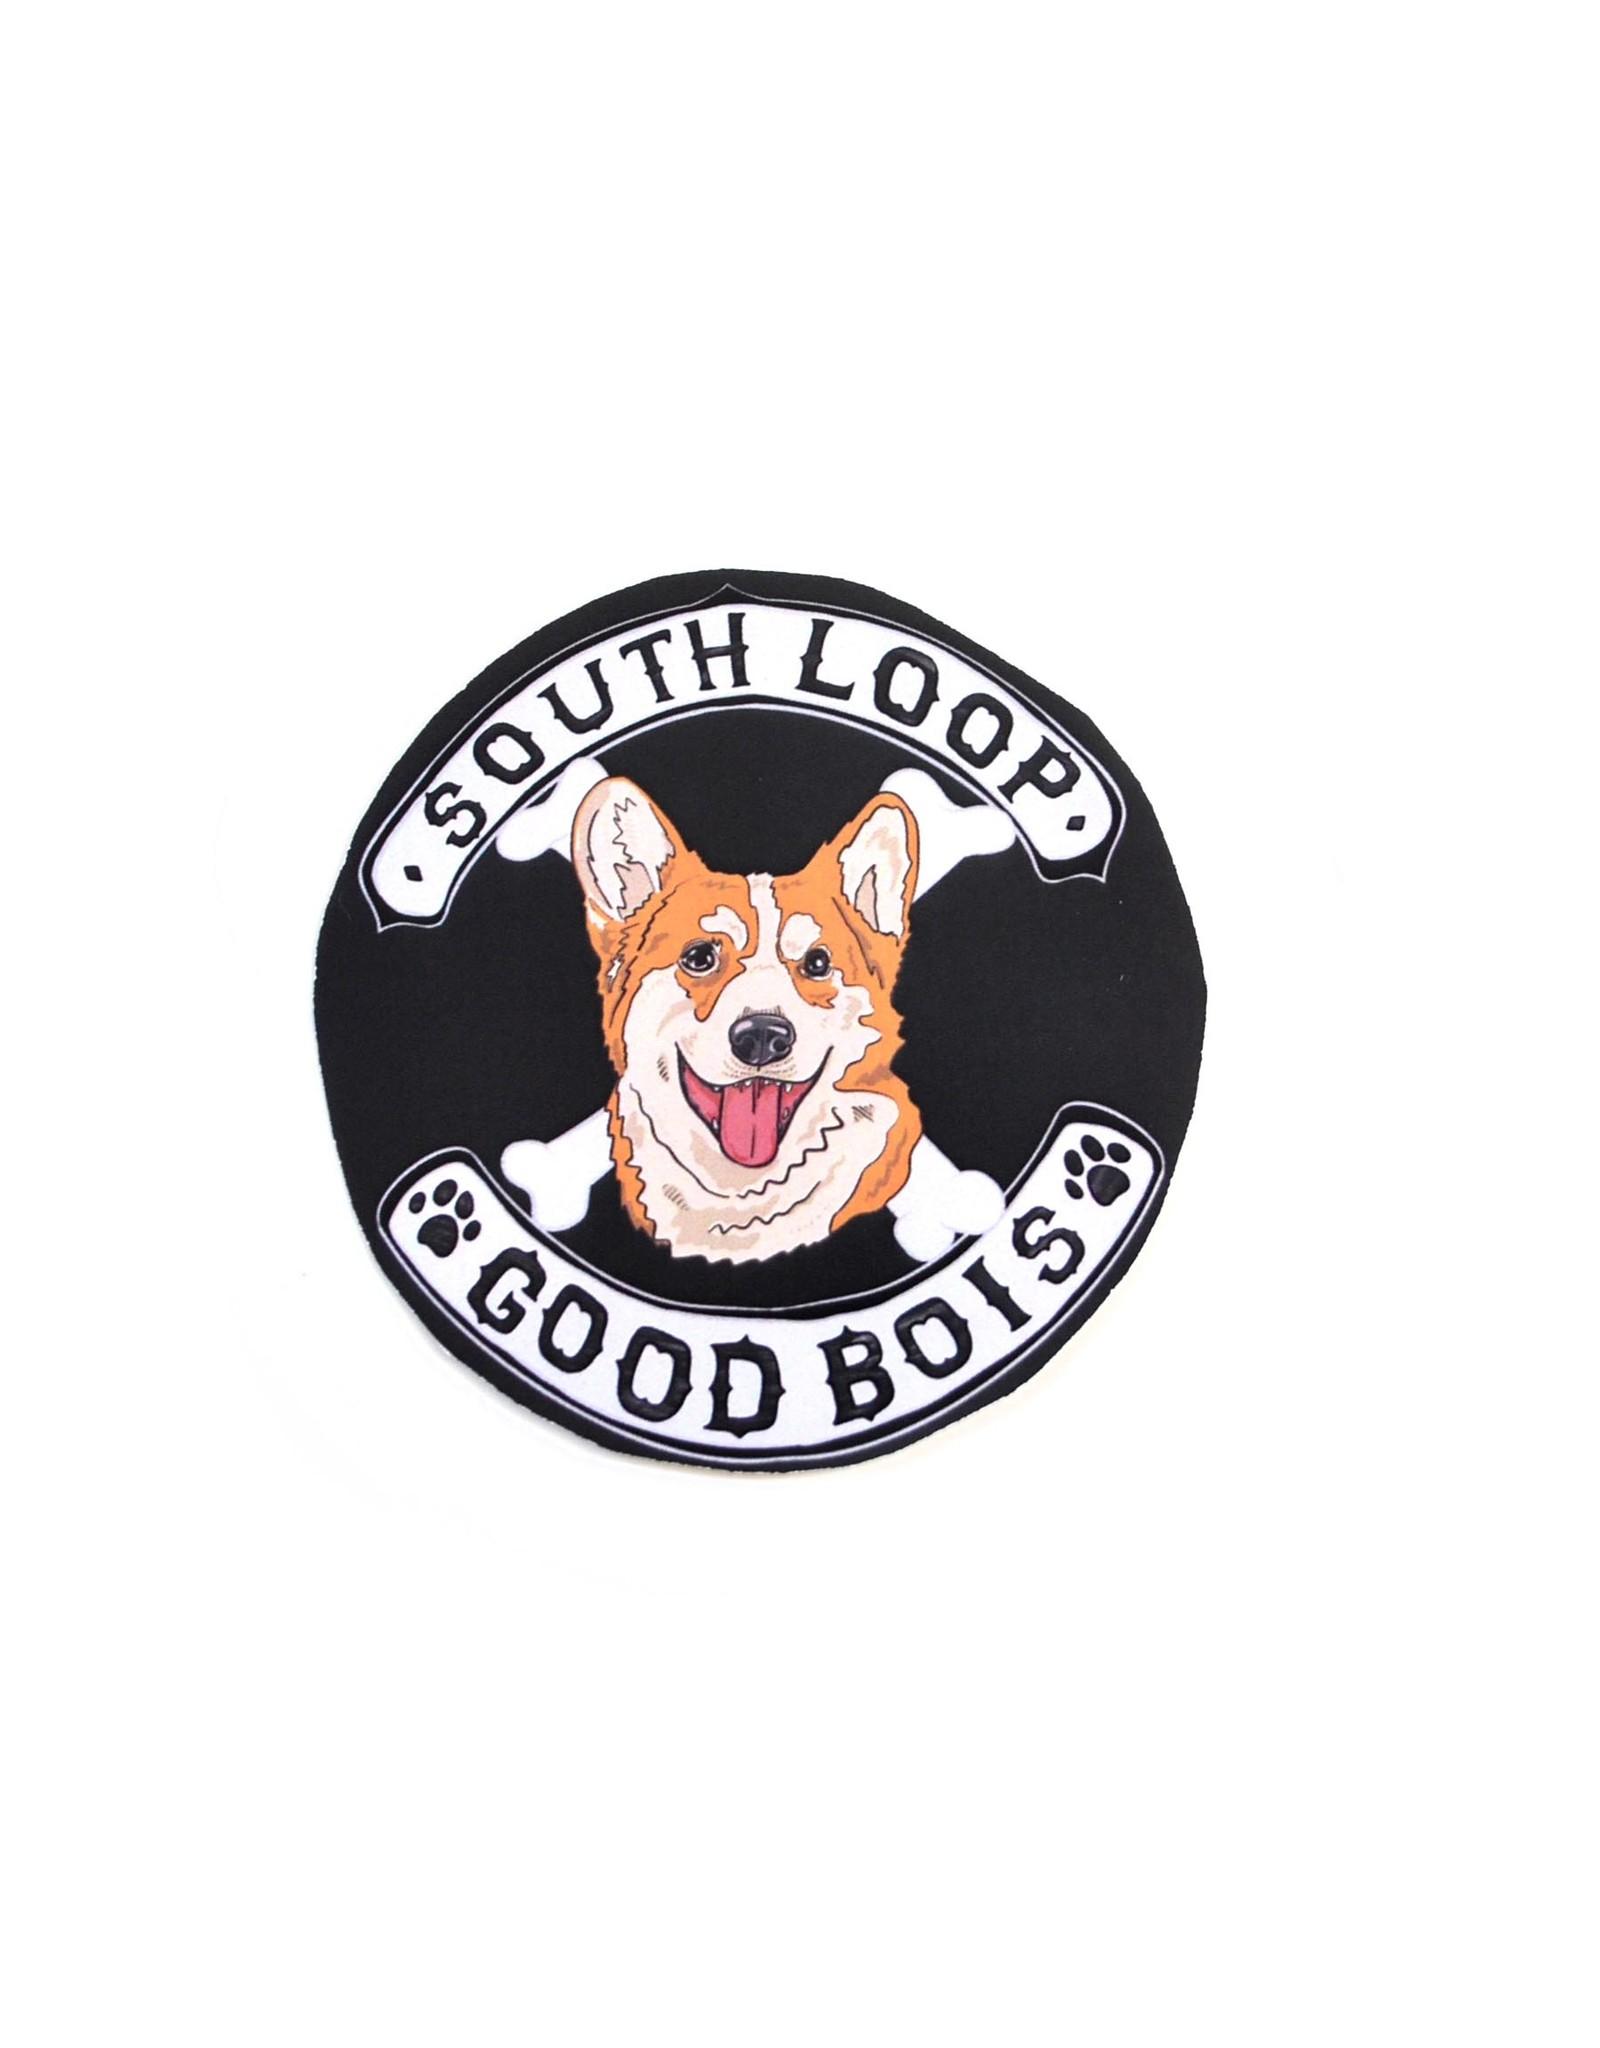 """Good Bois"" dog gang stickers by Michael Ulm"